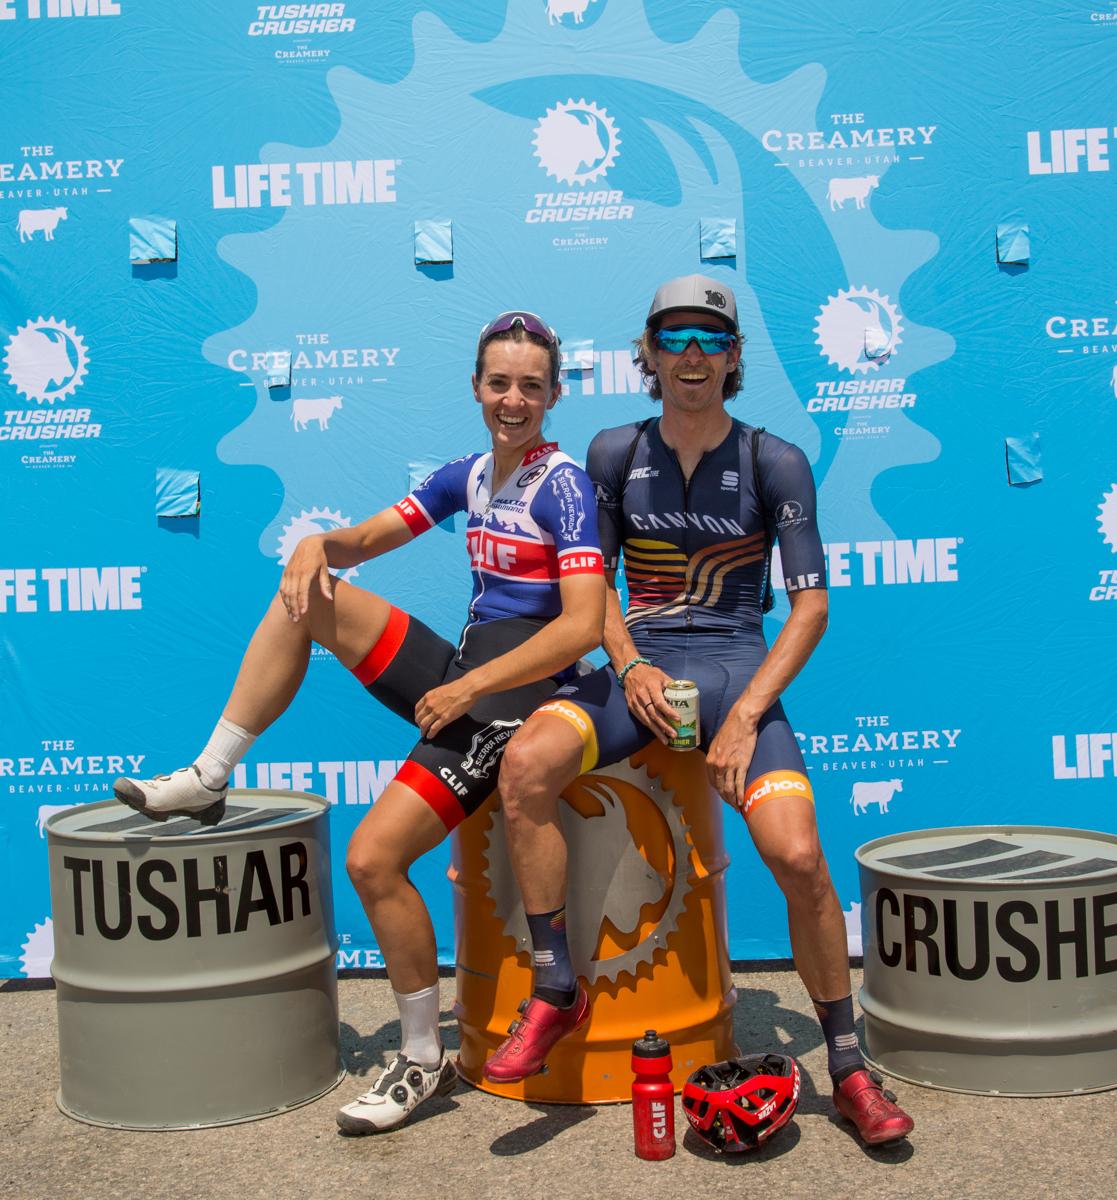 Peter Stetina & Sofia Gomez-Villafañe, winners of the 2021 Crusher in the Tushar. Photo courtesy Life Time